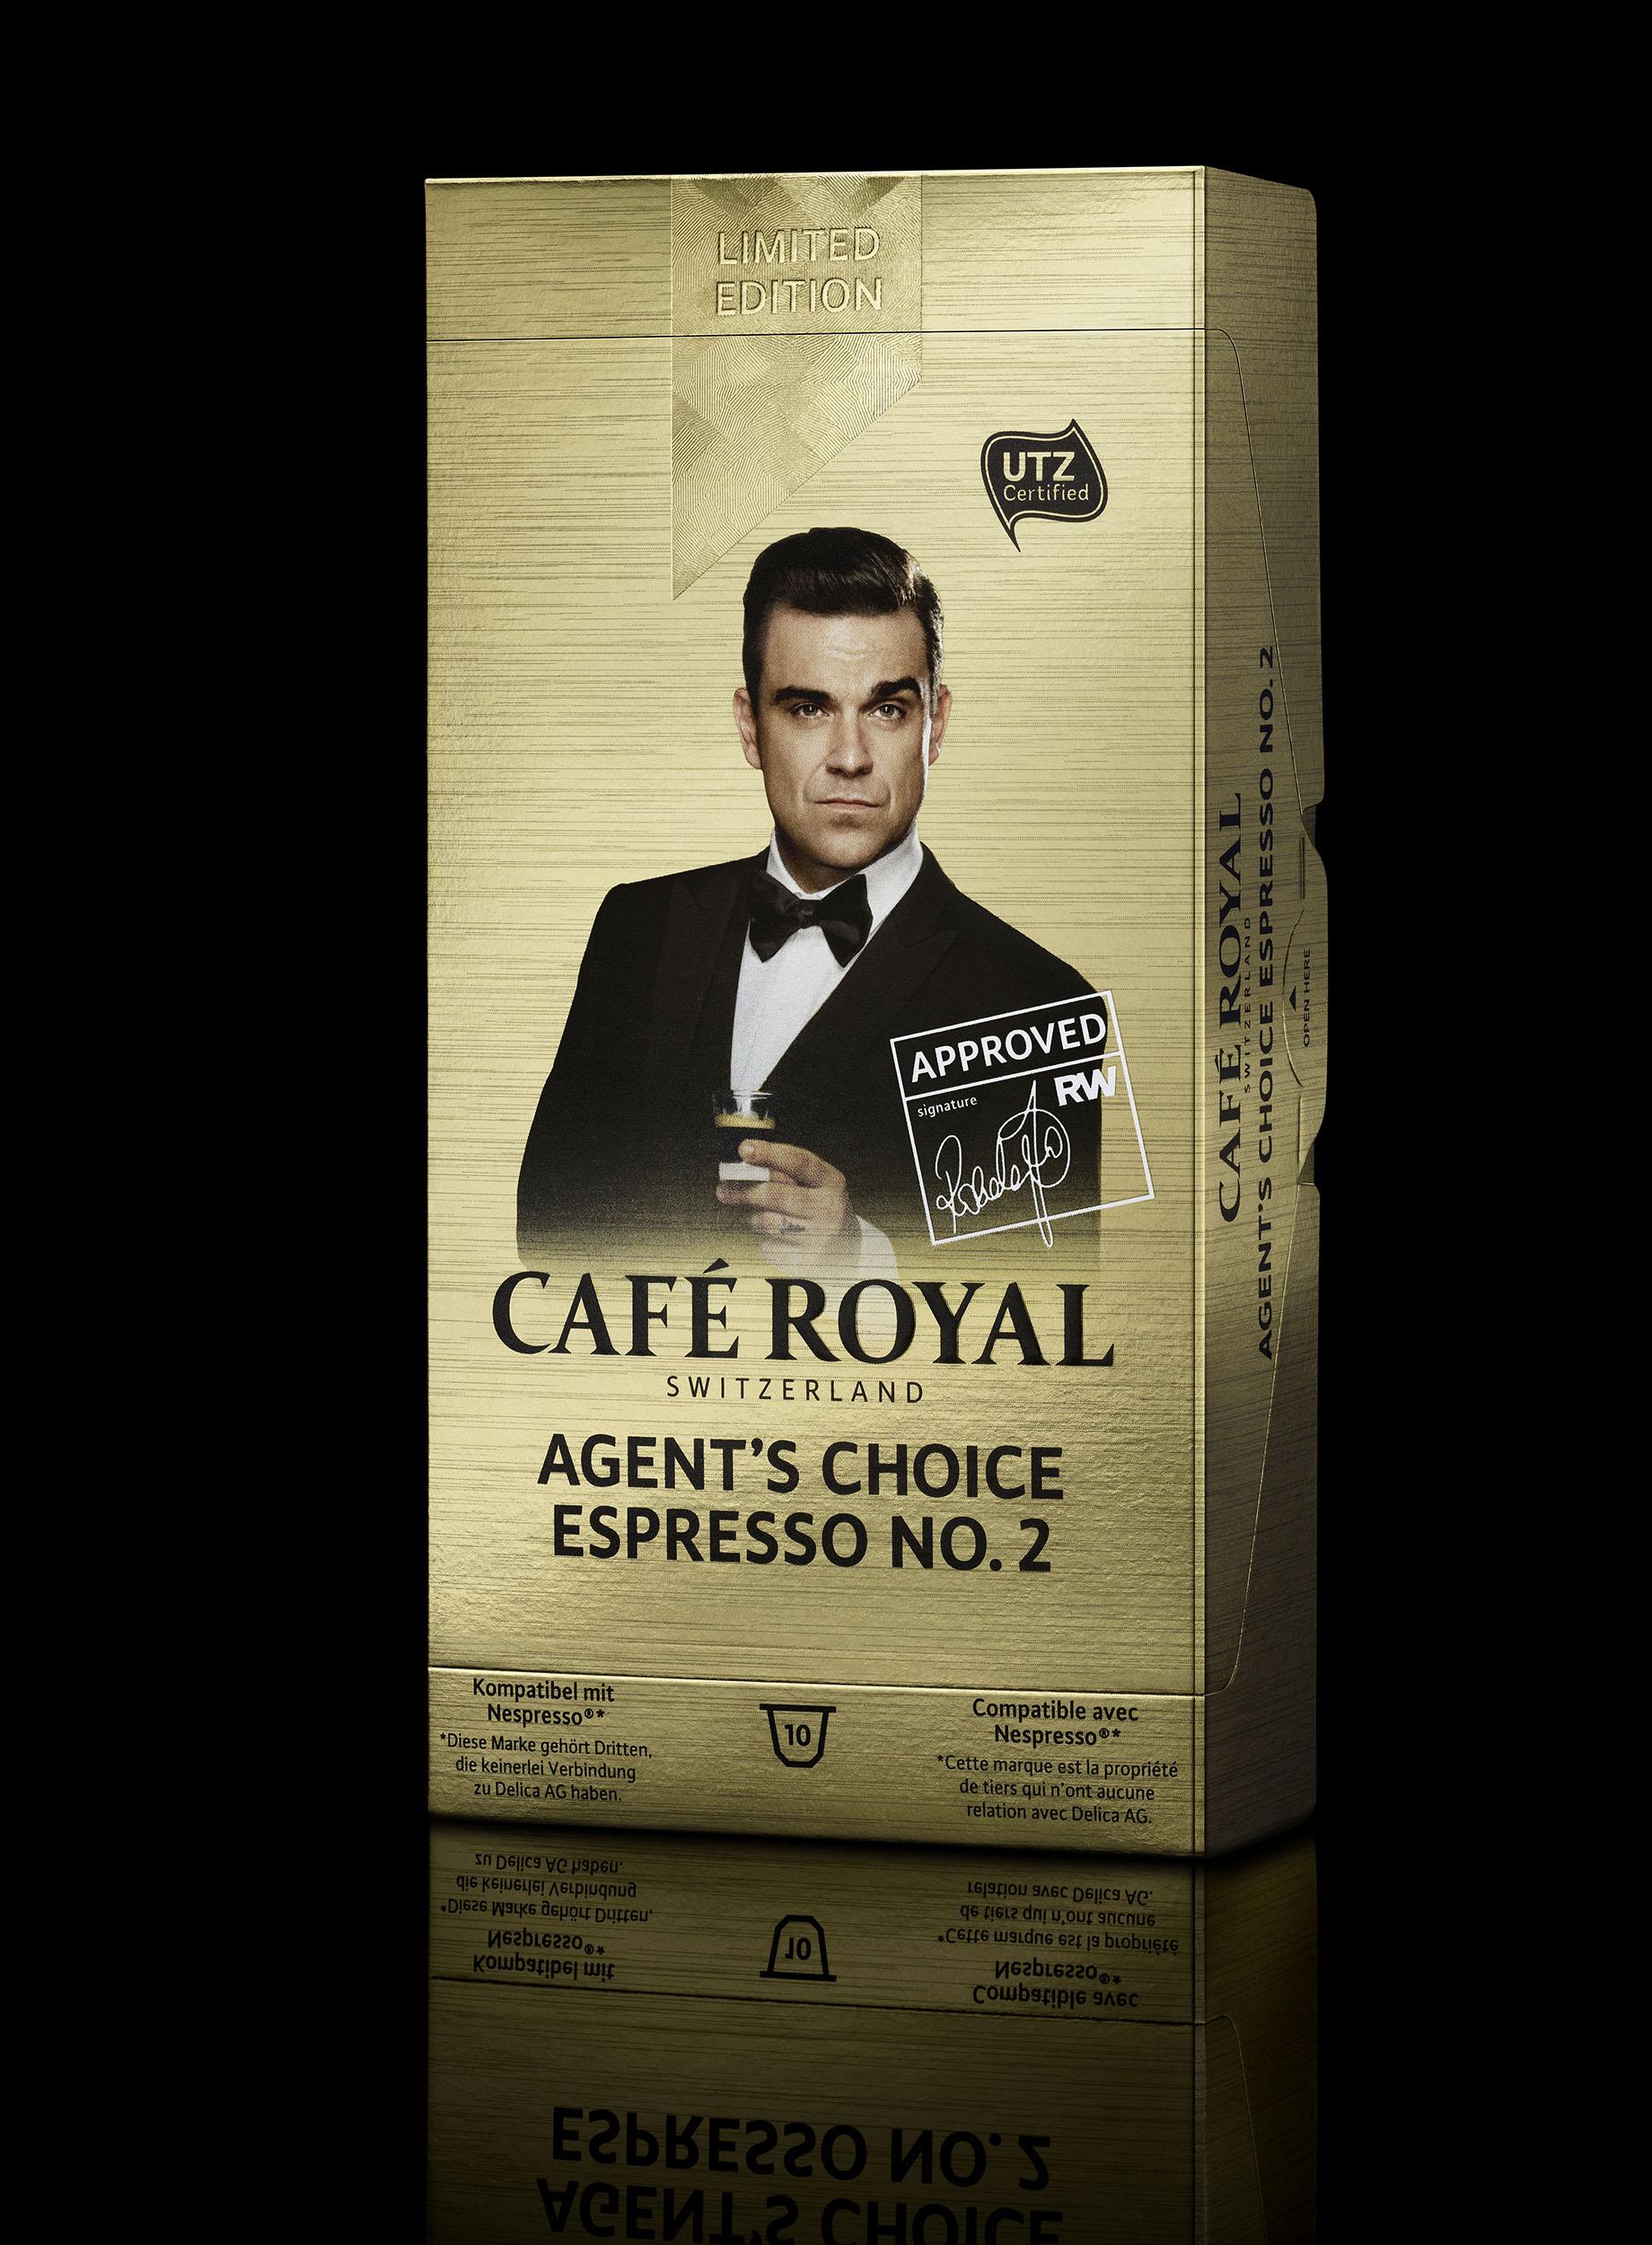 Café Royal / Serviceplan Zürich